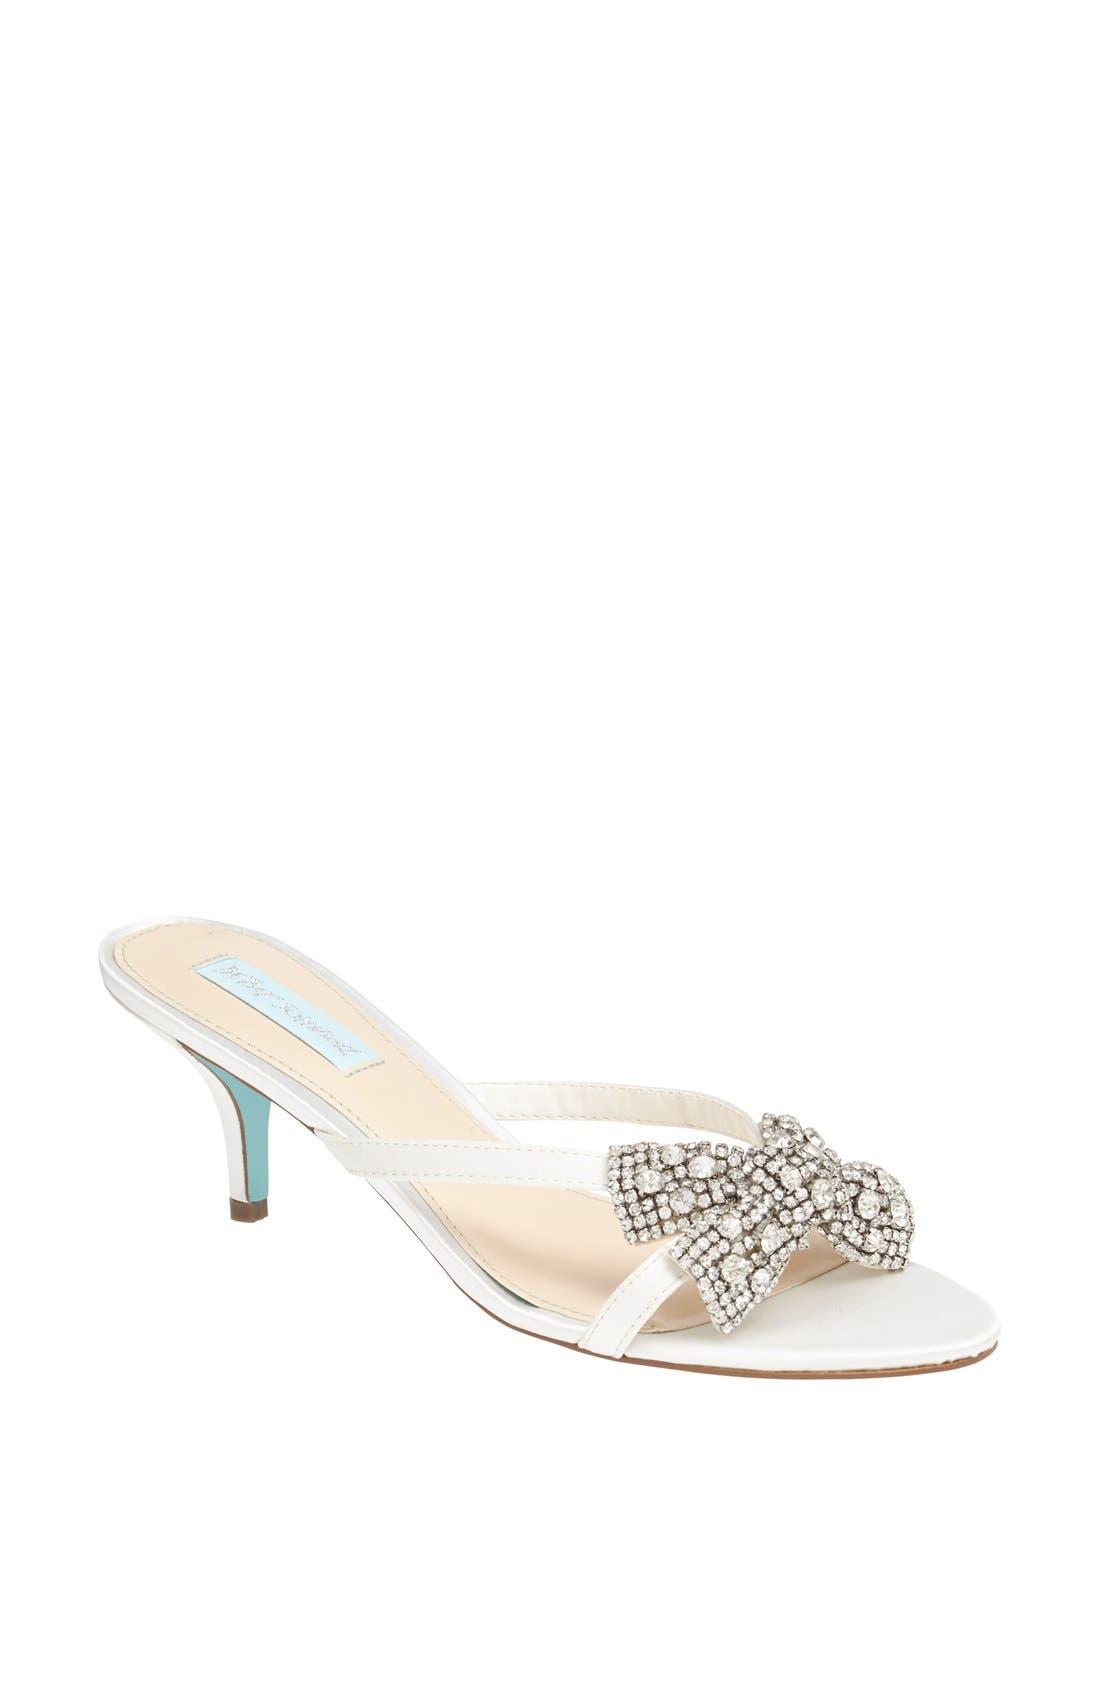 Main Image - Betsey Johnson 'Blush' Sandal